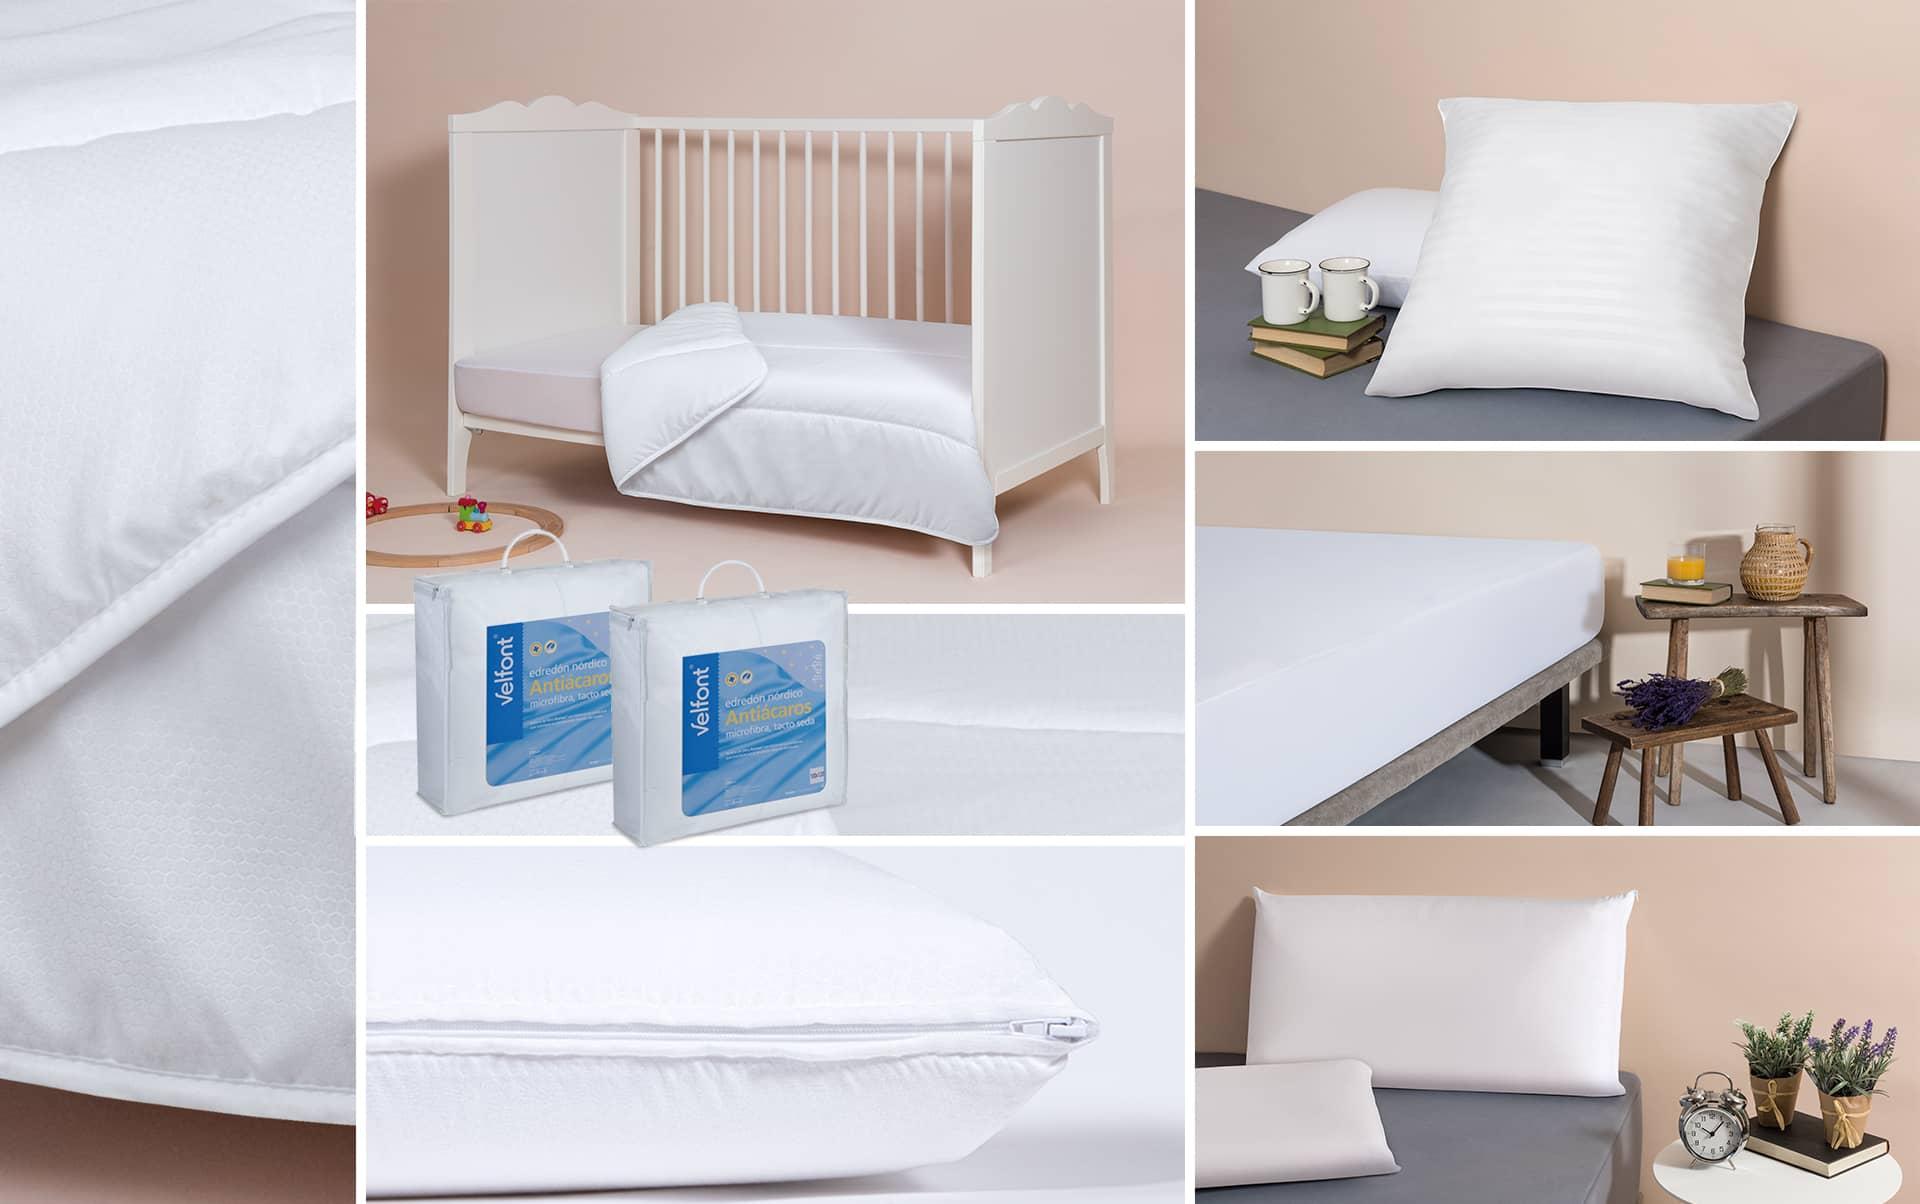 03 Retoque fotografico ropa de cama Velfont - Sesiones fotográficas para sector textil